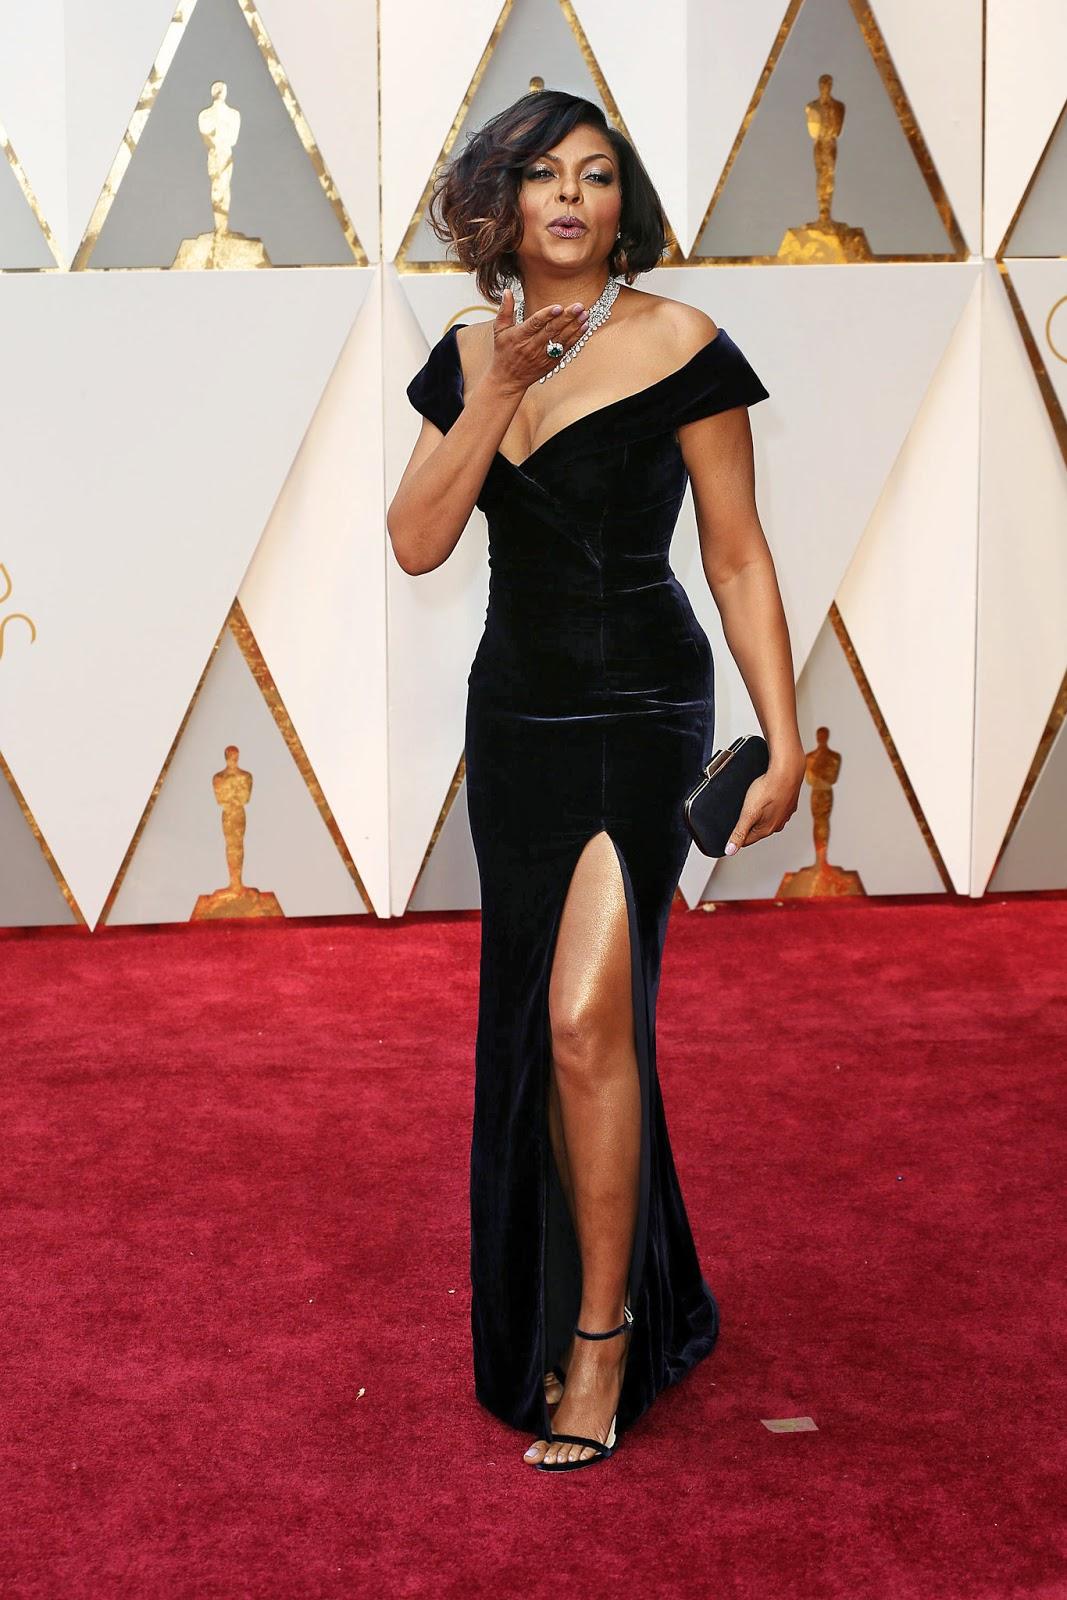 Taraji P. Henson - Alberta Ferretti Oscars 2017